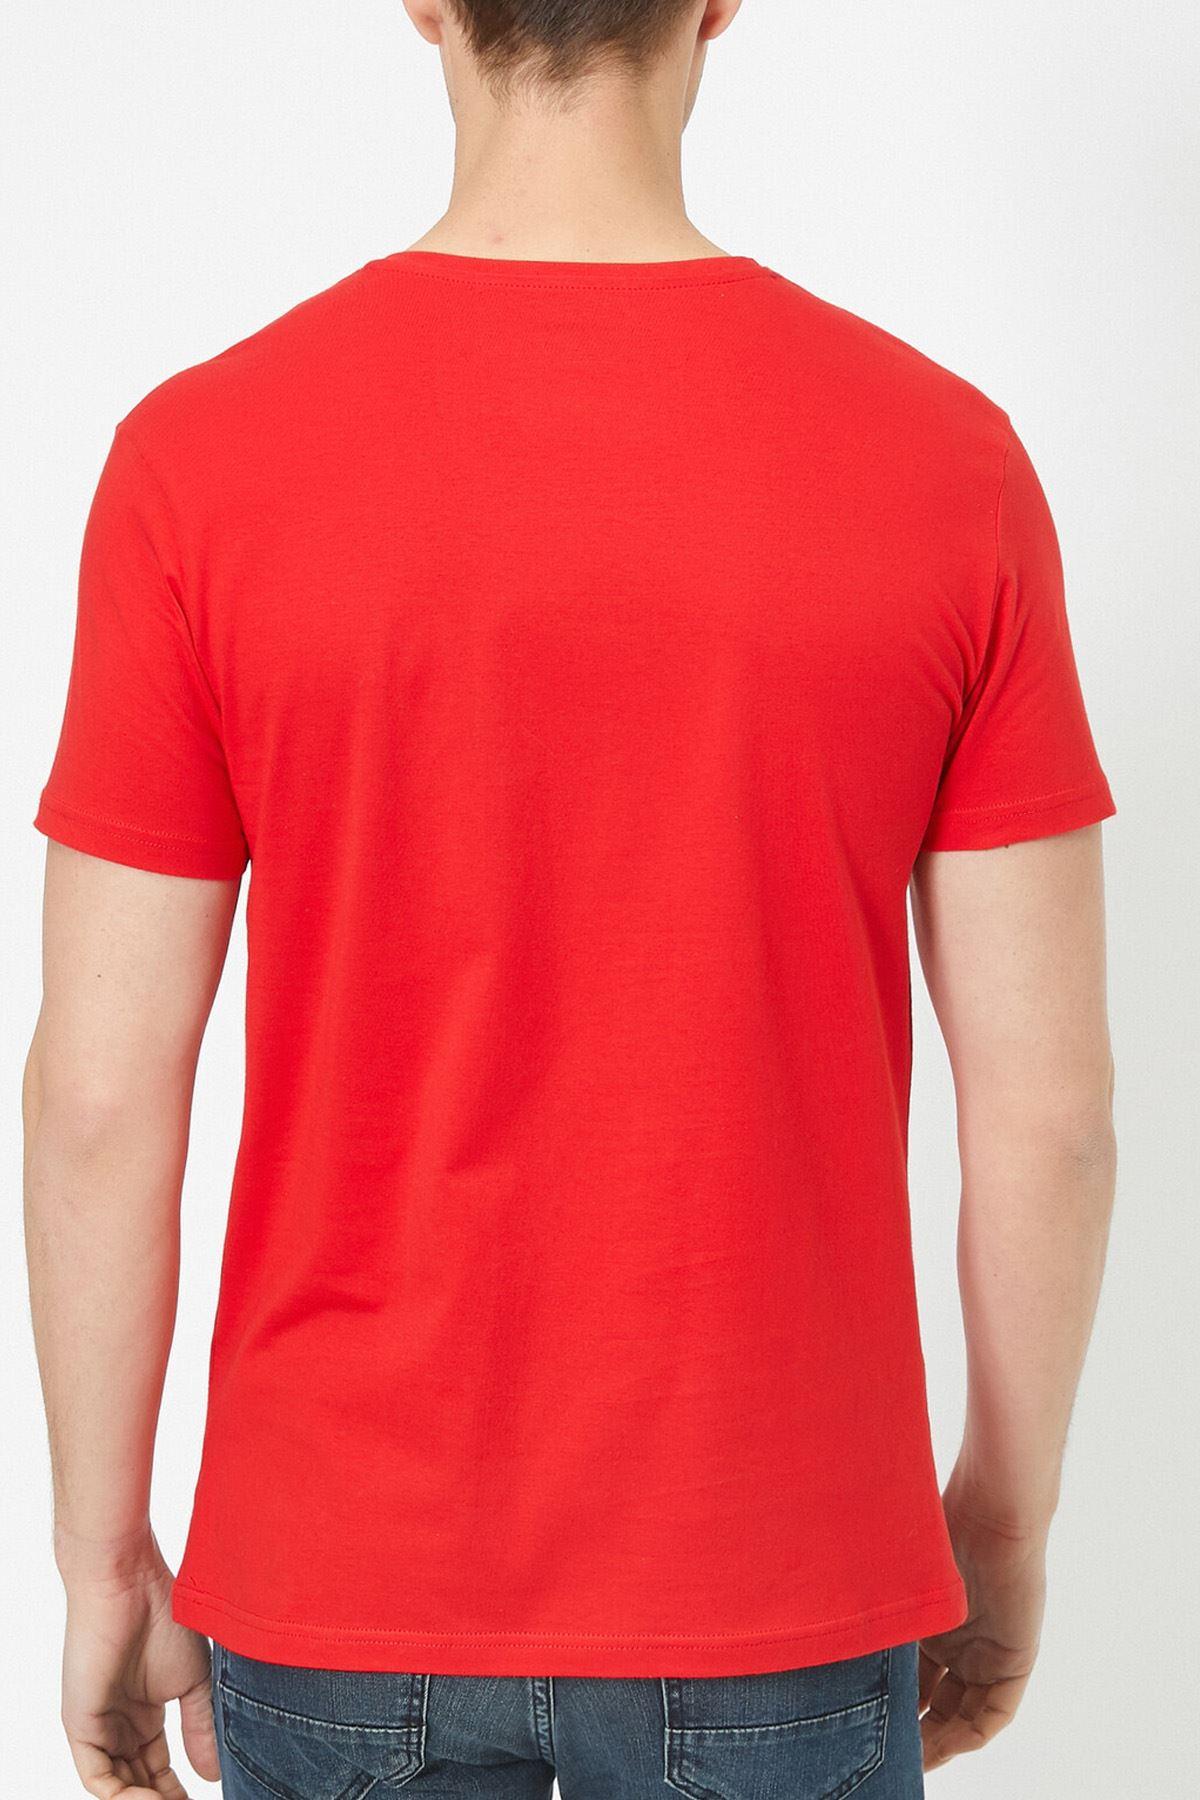 Anime Monkey 02 Kırmızı Erkek Tshirt - Tişört